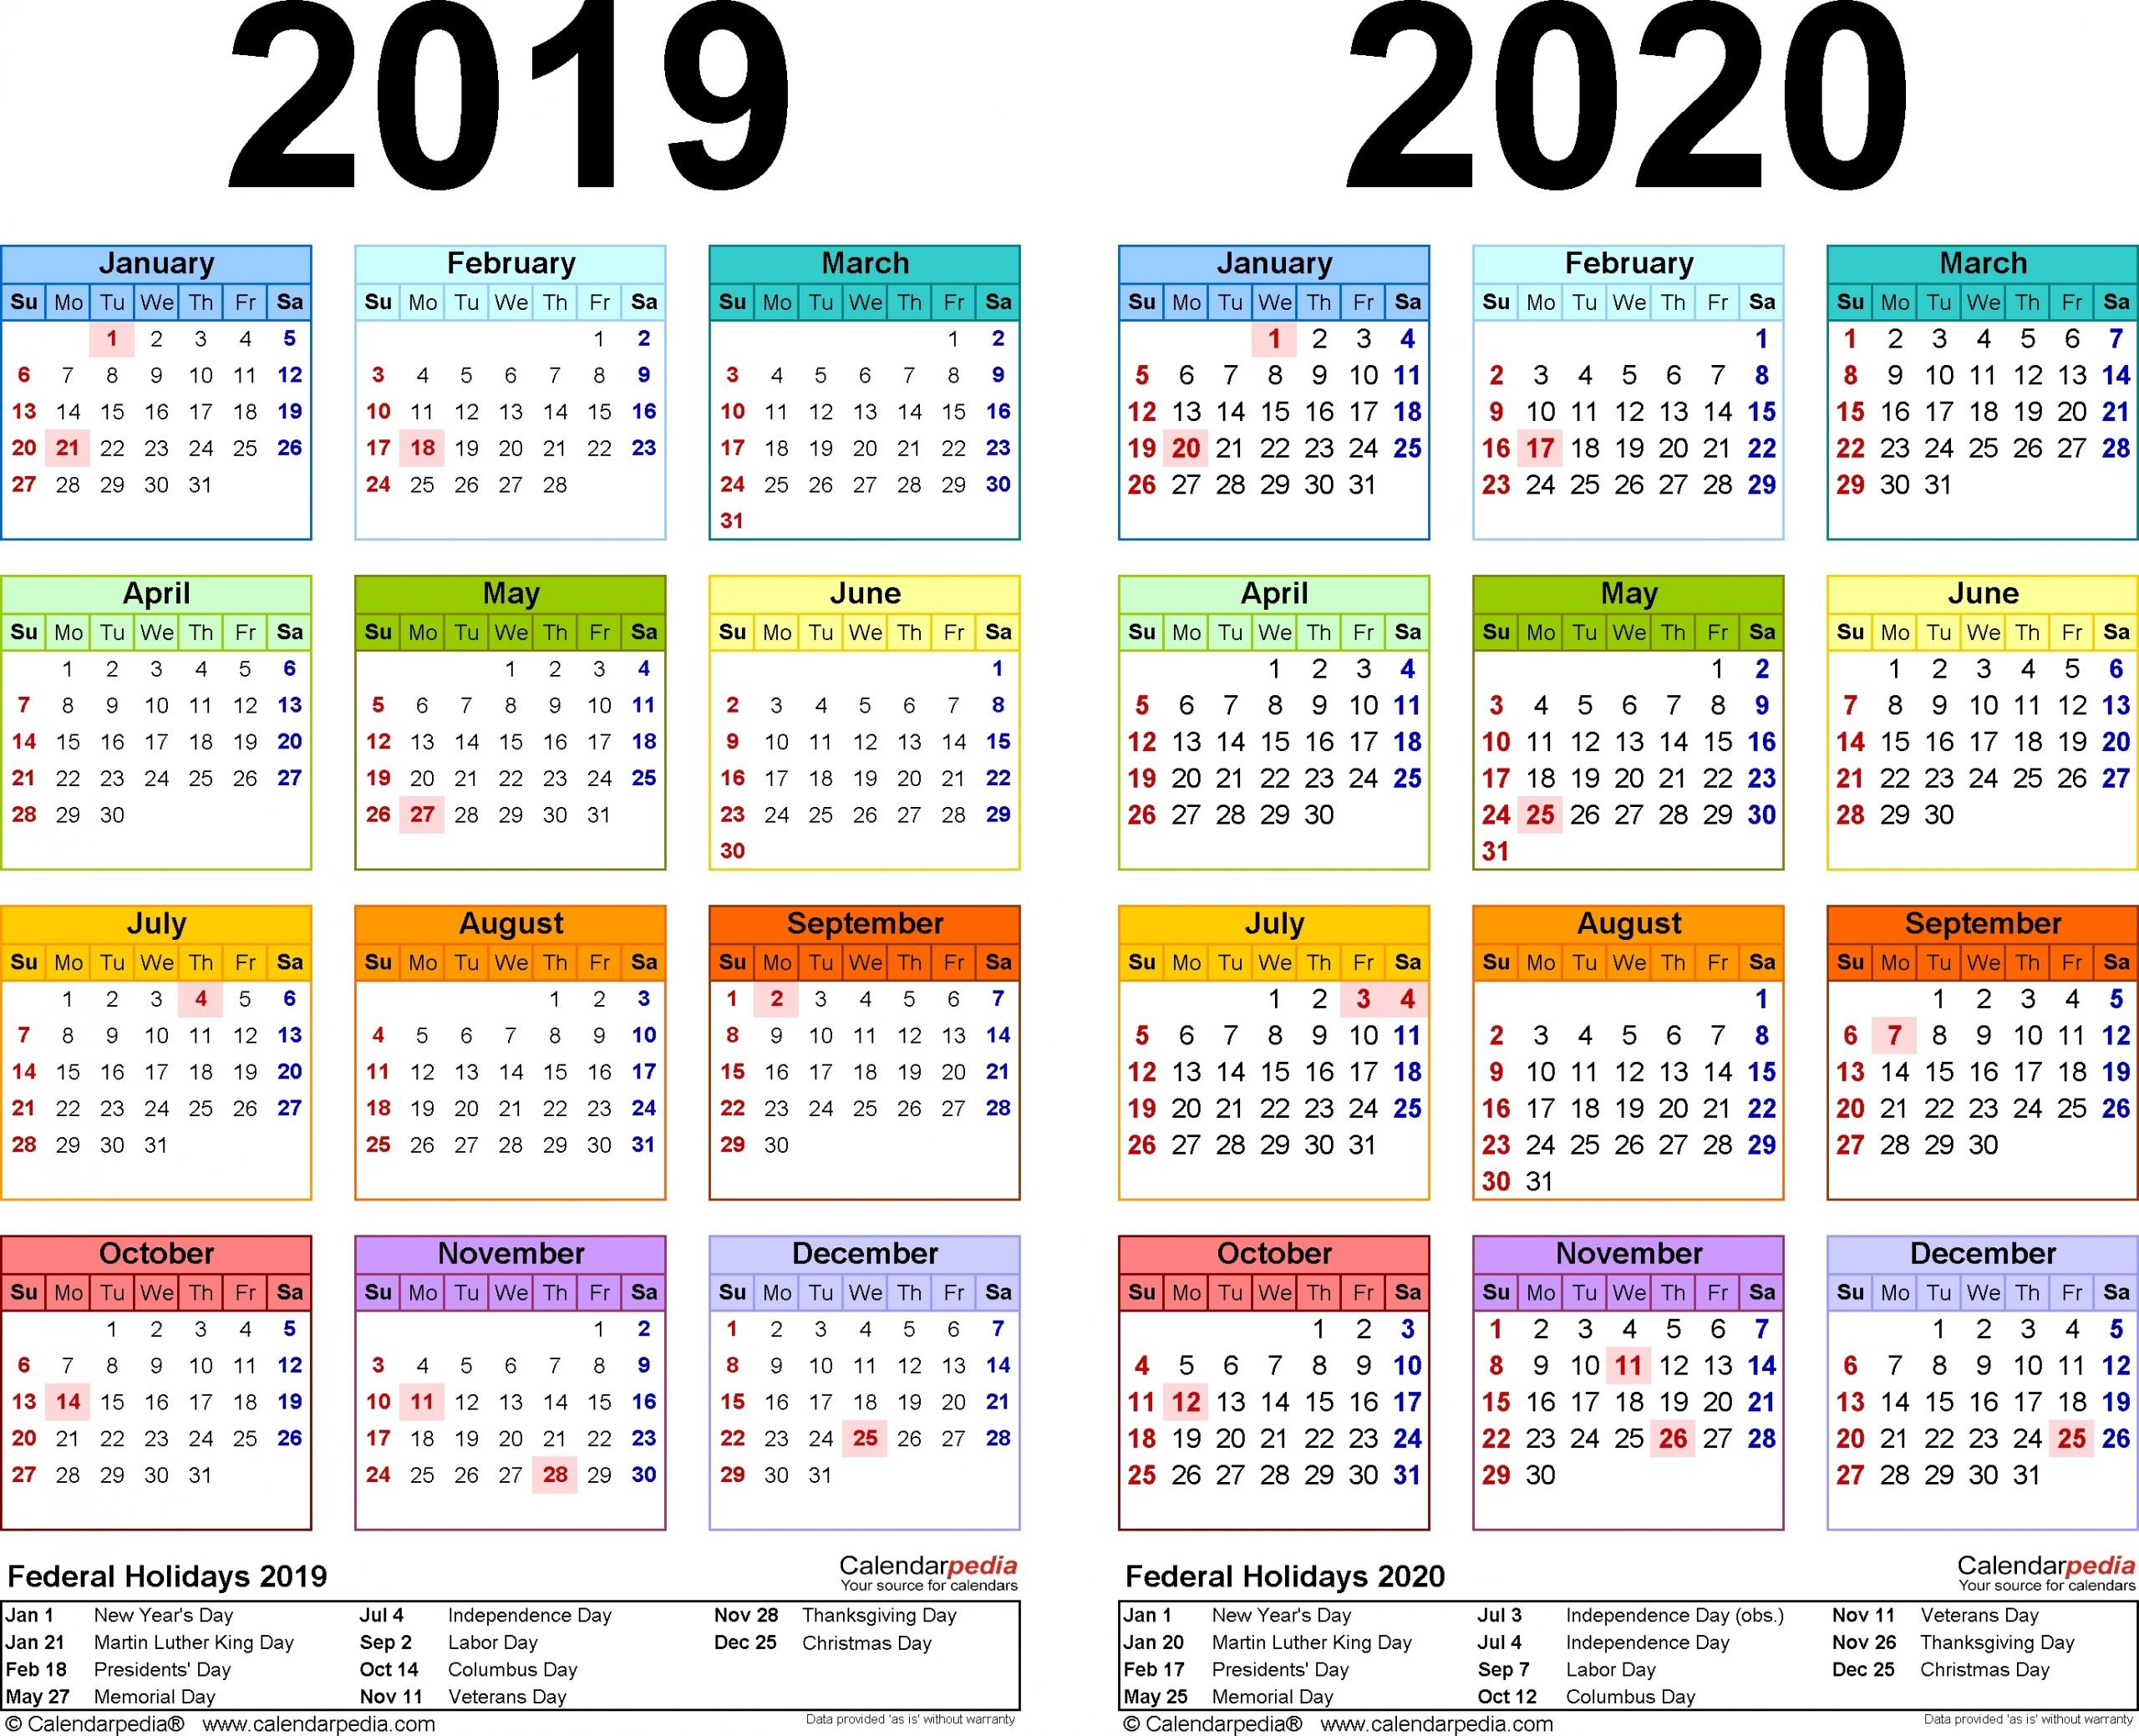 Perpetual Depo Provera Calculator  Depo Proveta Injection Calendar Calendar Calculator